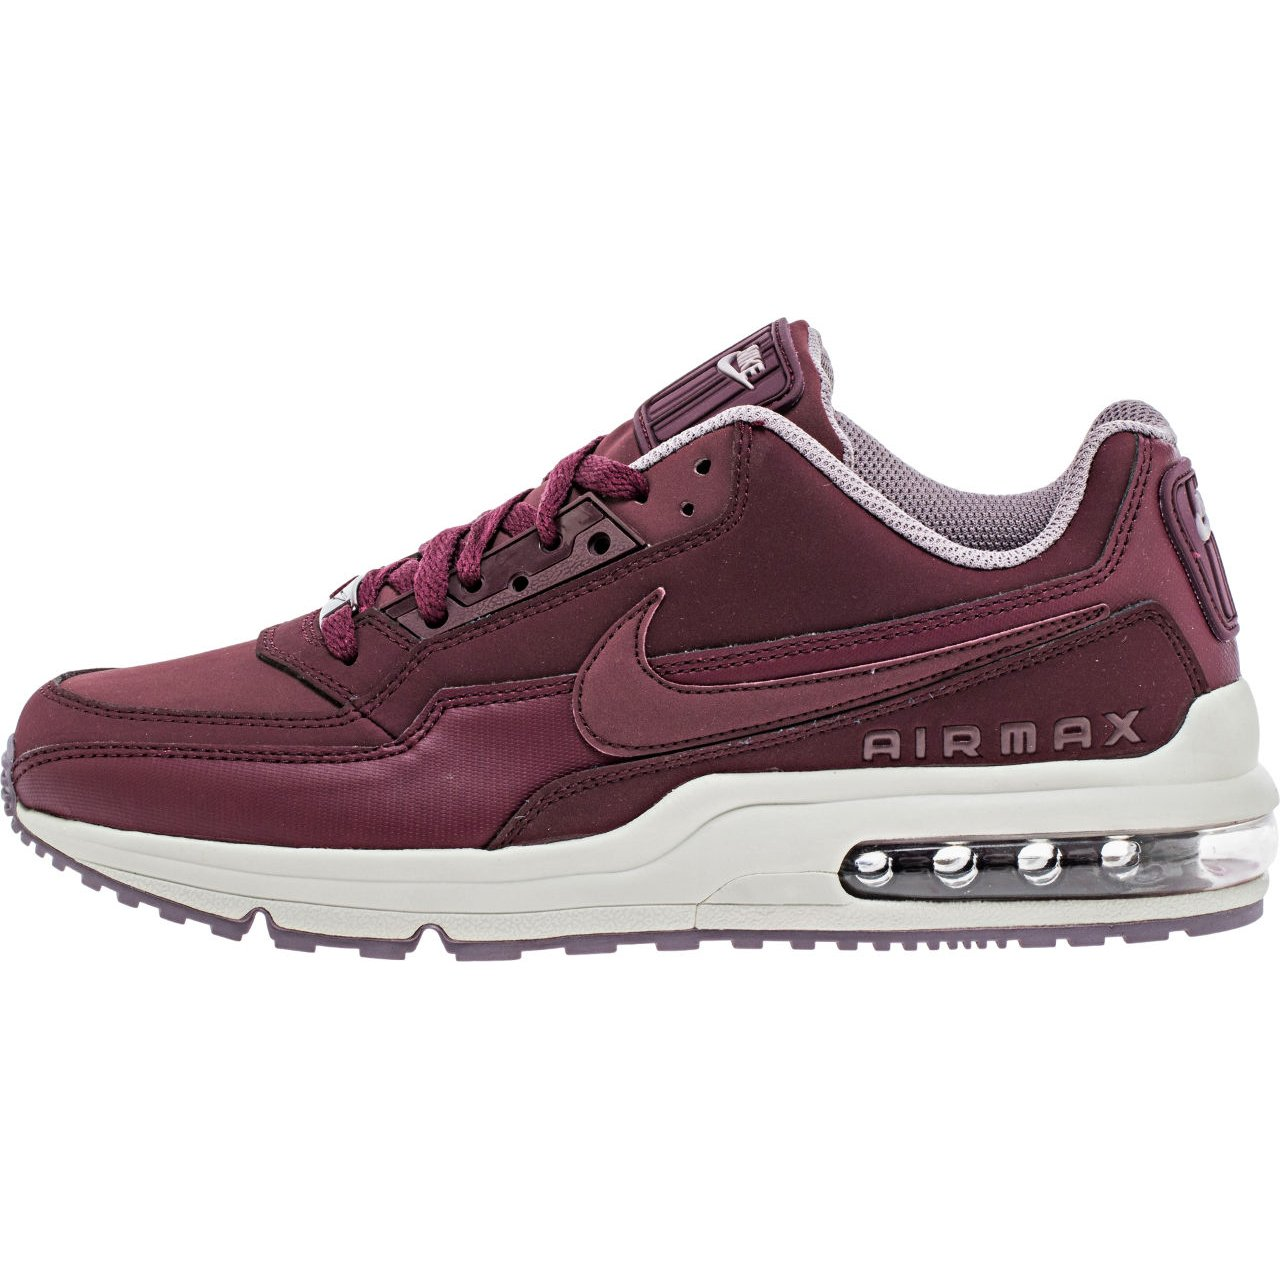 b49ee59947ea44 Galleon - Nike Air Max LTD 3 Men s Running Shoes Night Maroon 687977-600  (10 D(M) US)